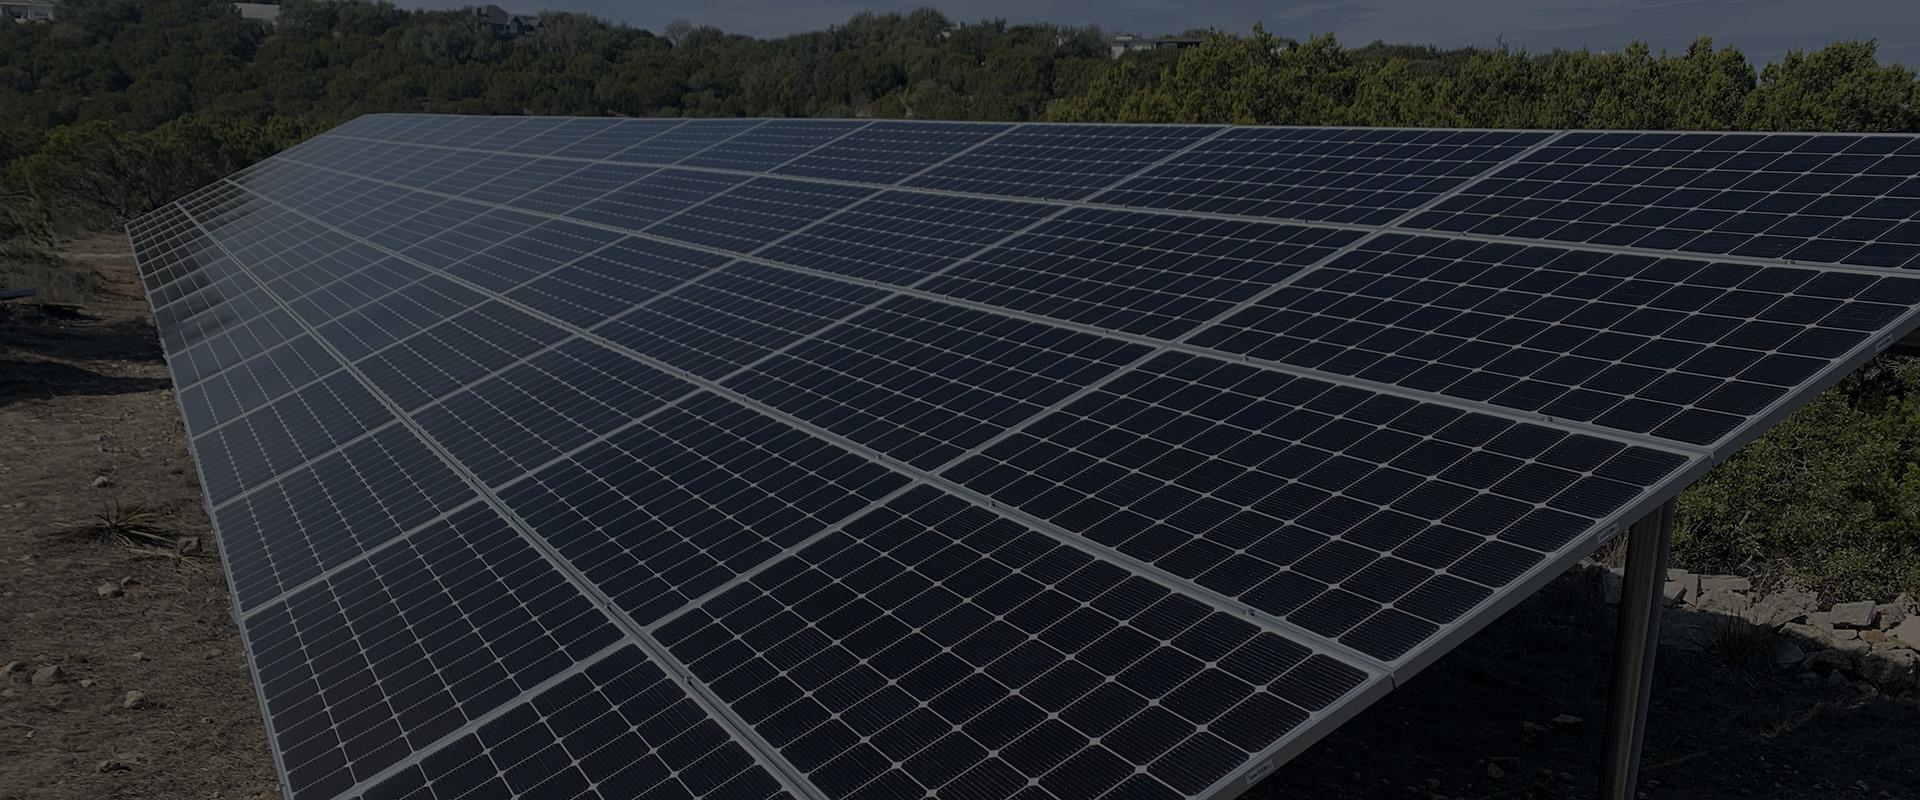 S-Energy Solar Panels